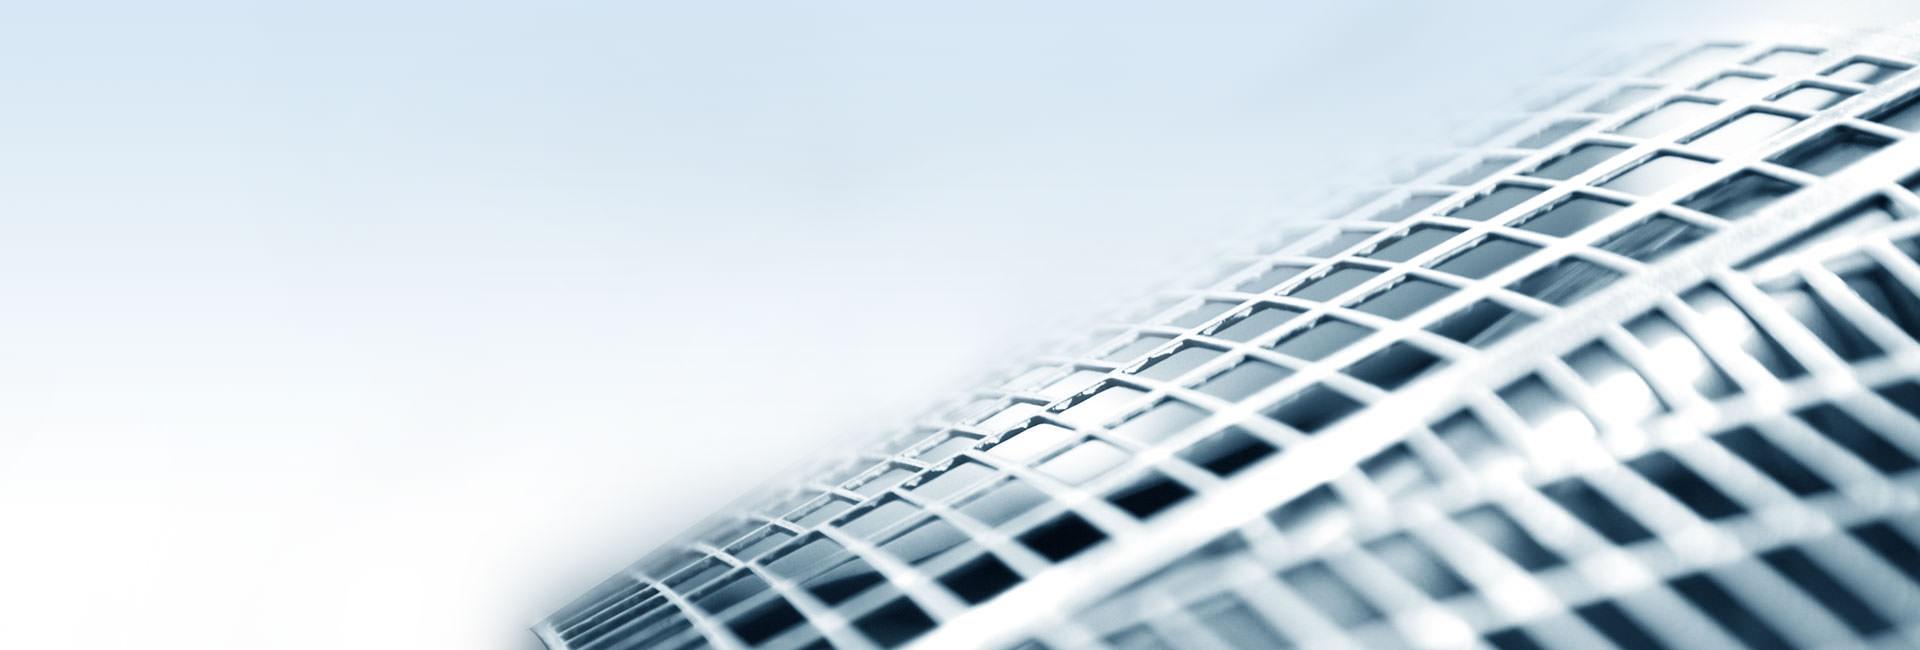 Tam hassasiyet damgalı pozitif ızgarada PowerFrame patentli ızgara teknolojisini bulabilirsiniz